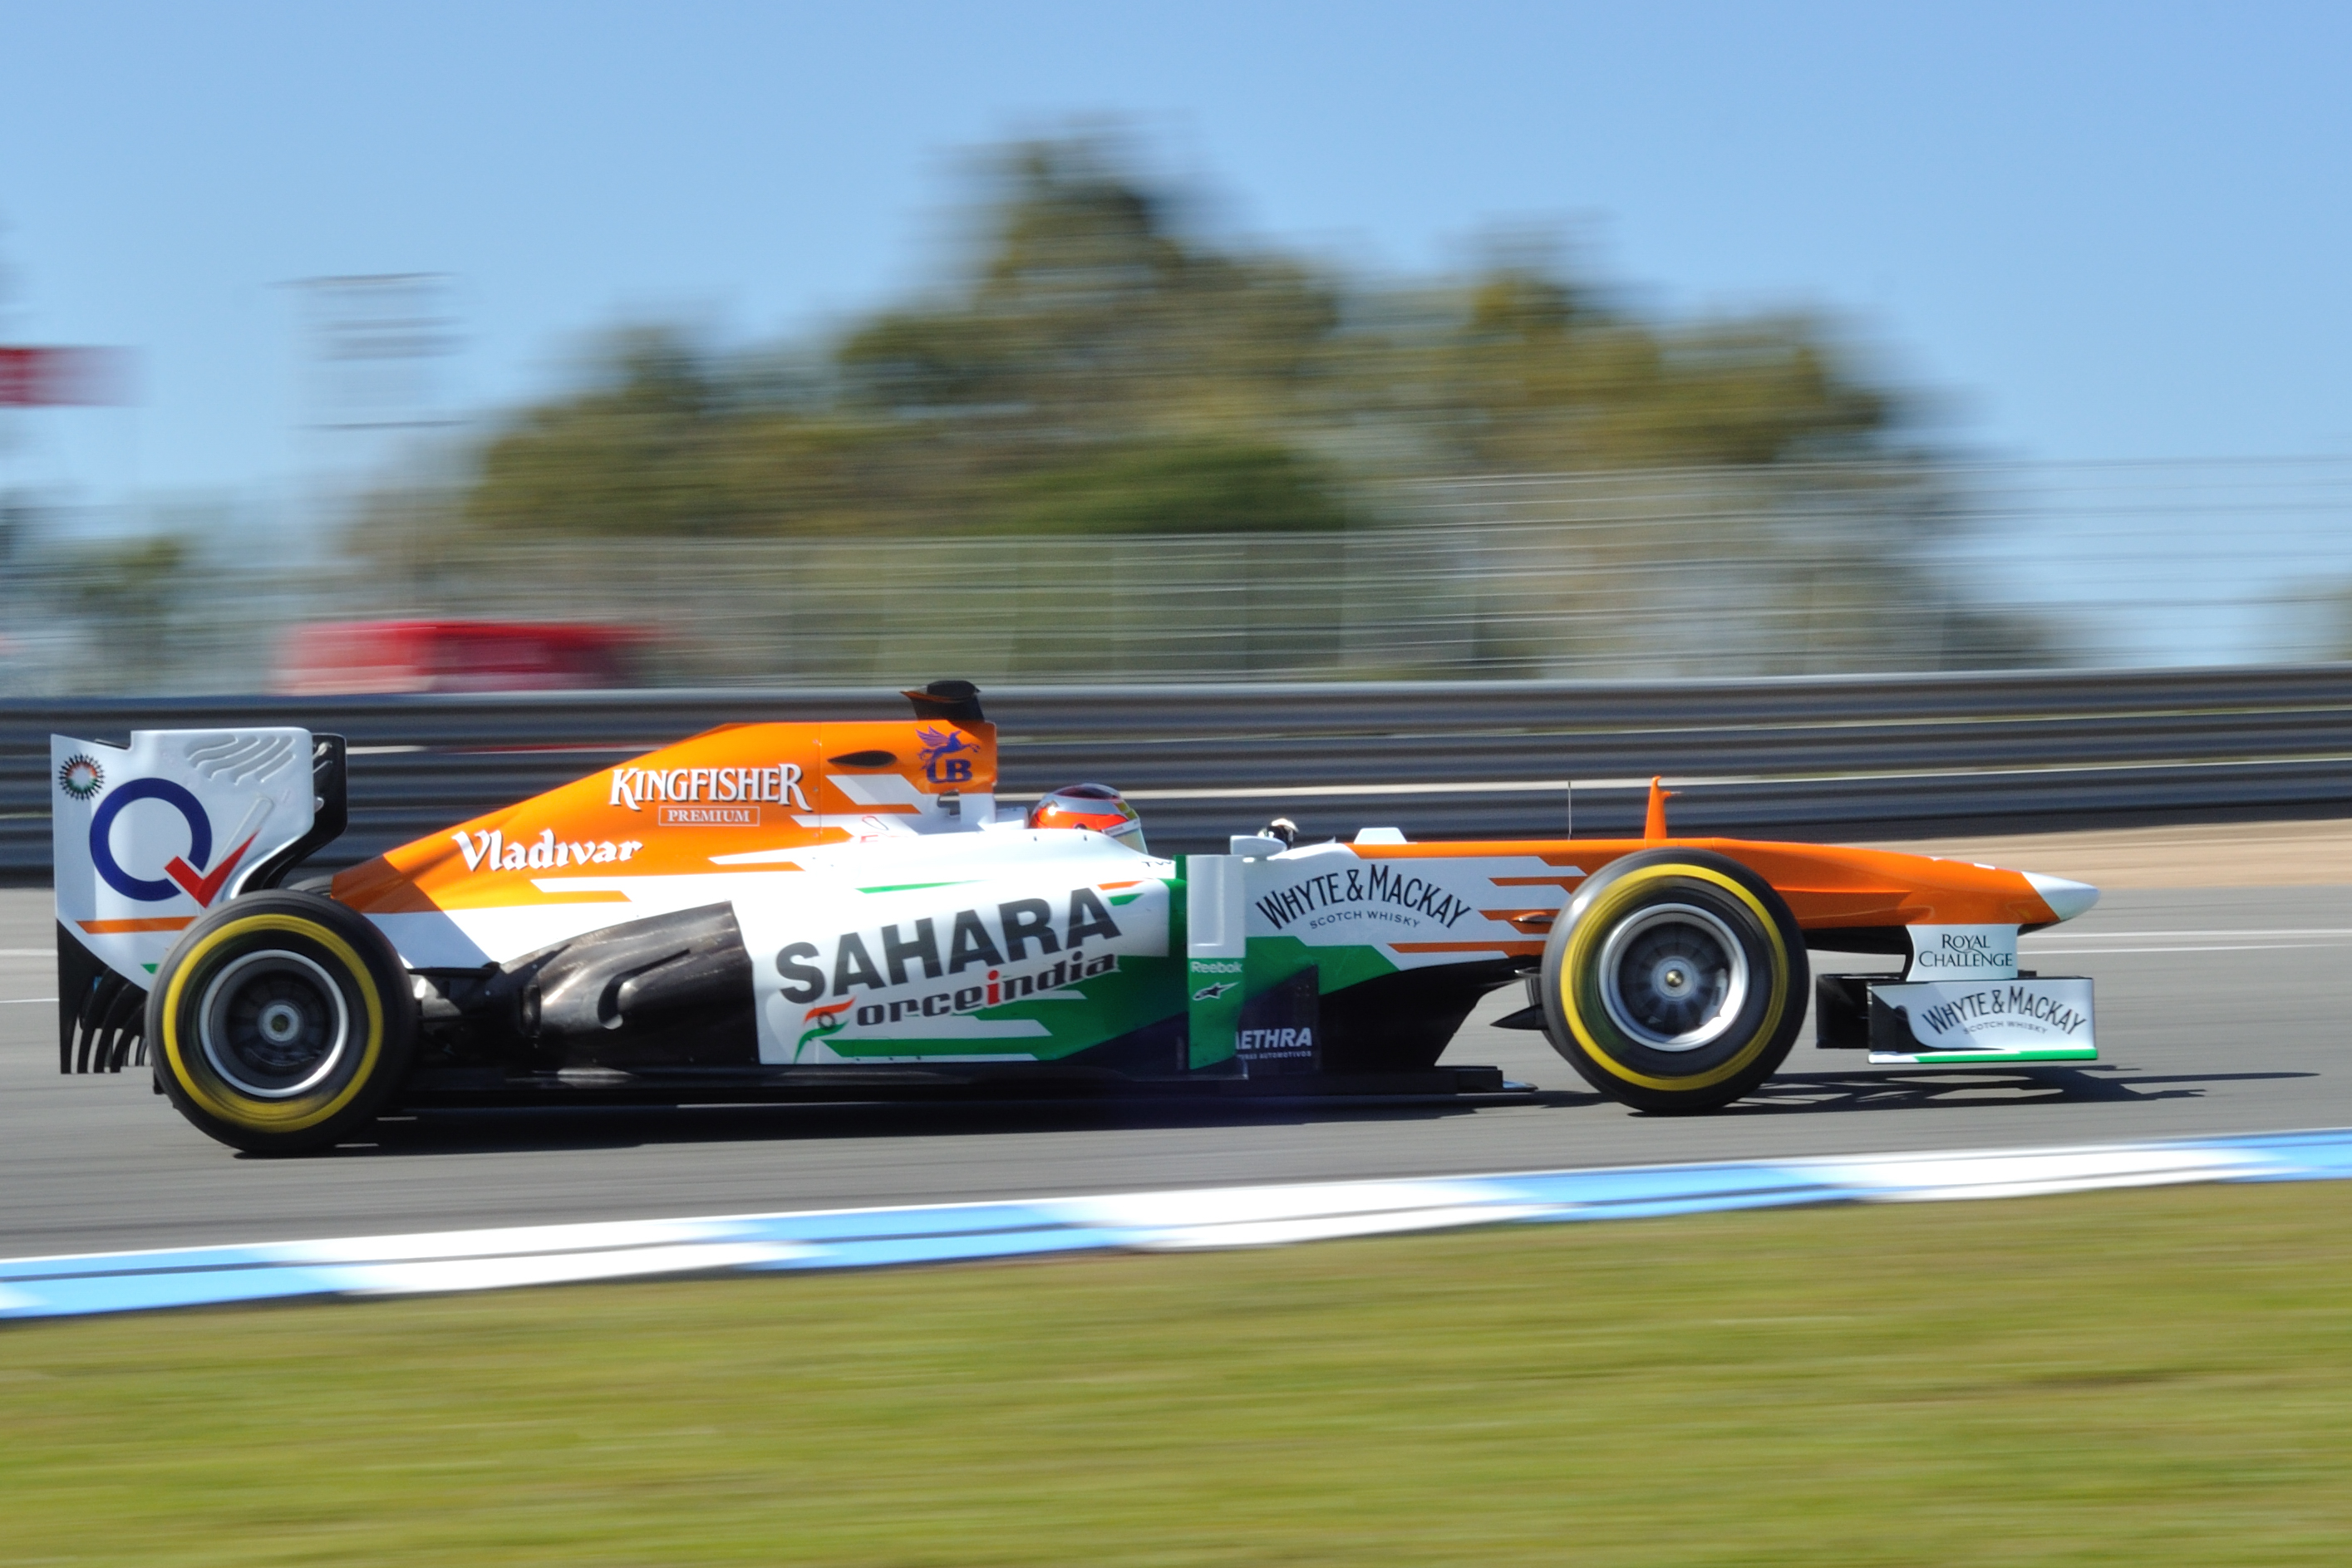 Sahara Force India F1 Background 9